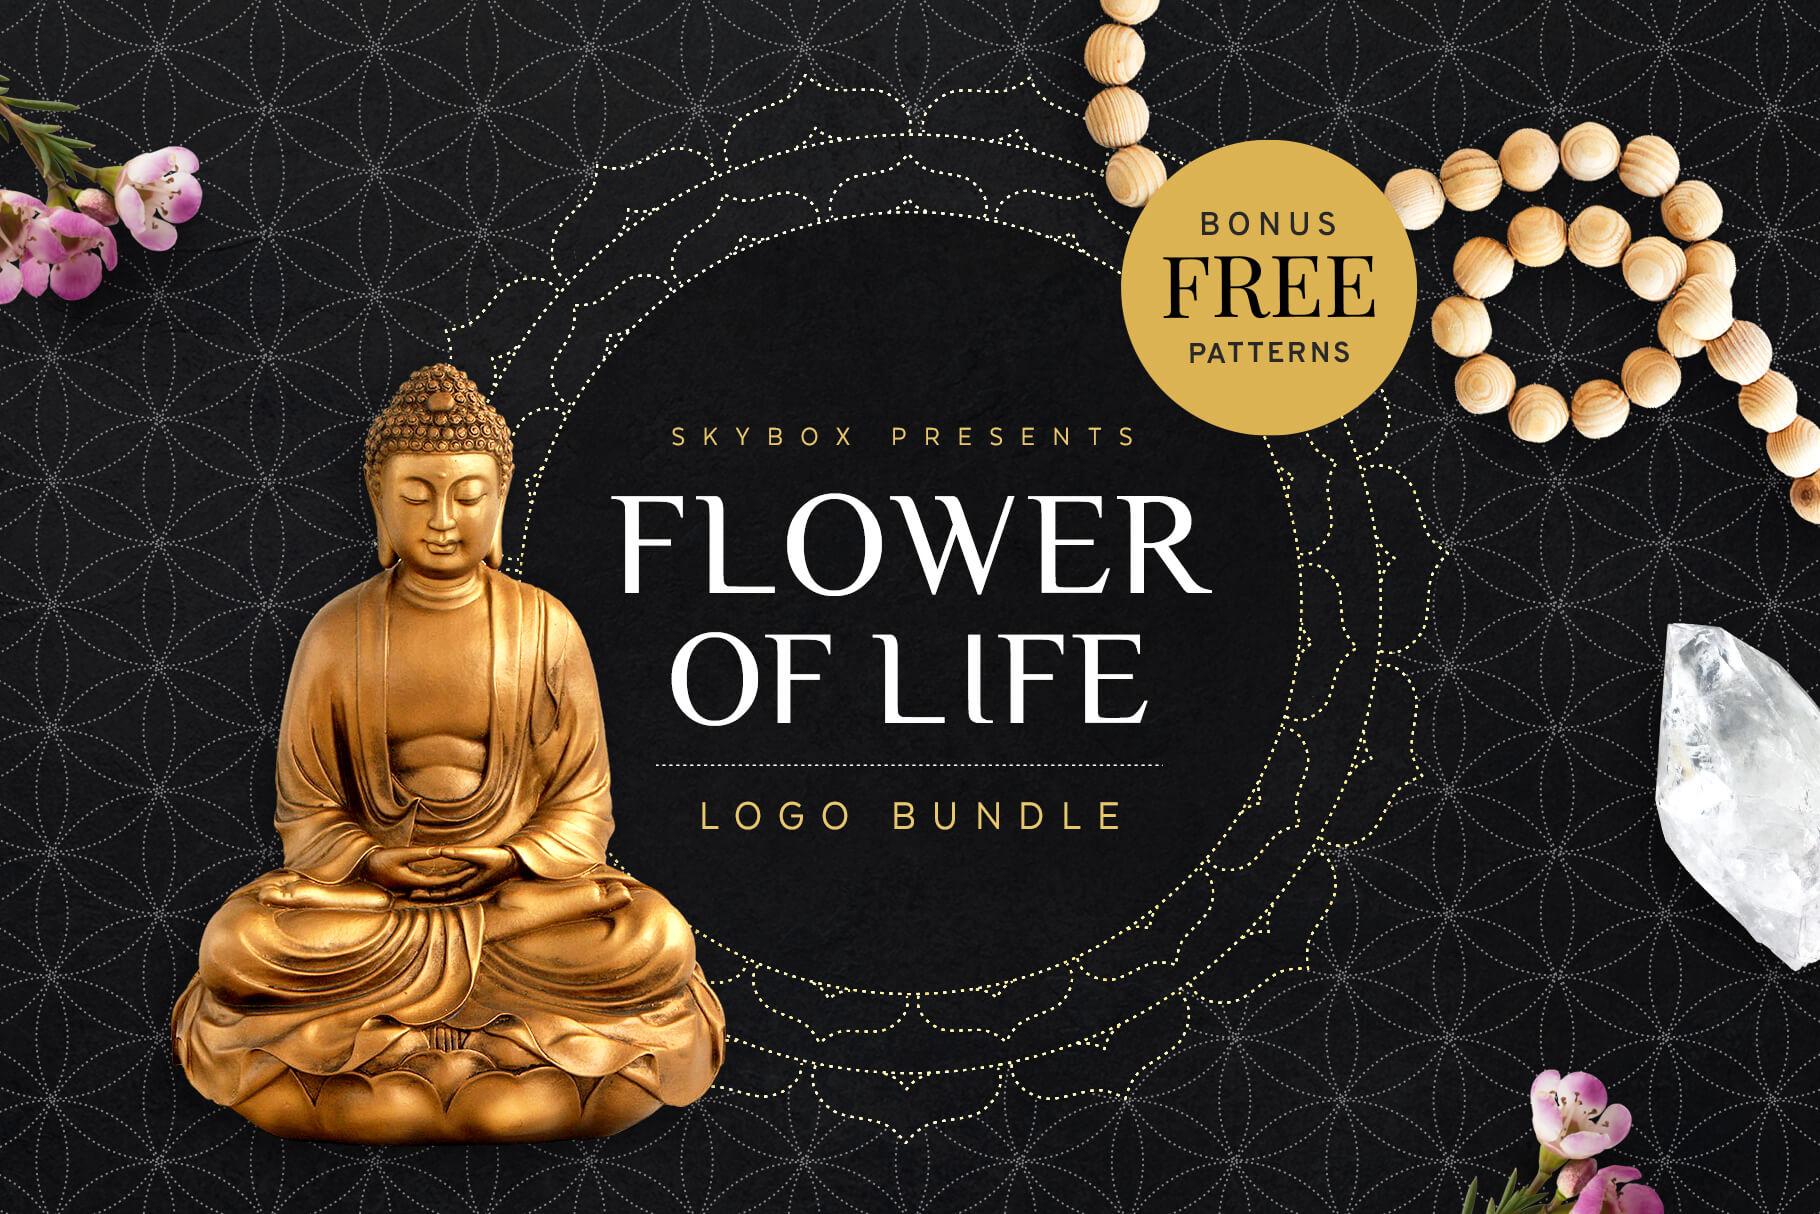 Creative Graphic Design - Cosmic Bundle: Flower Of Life 1